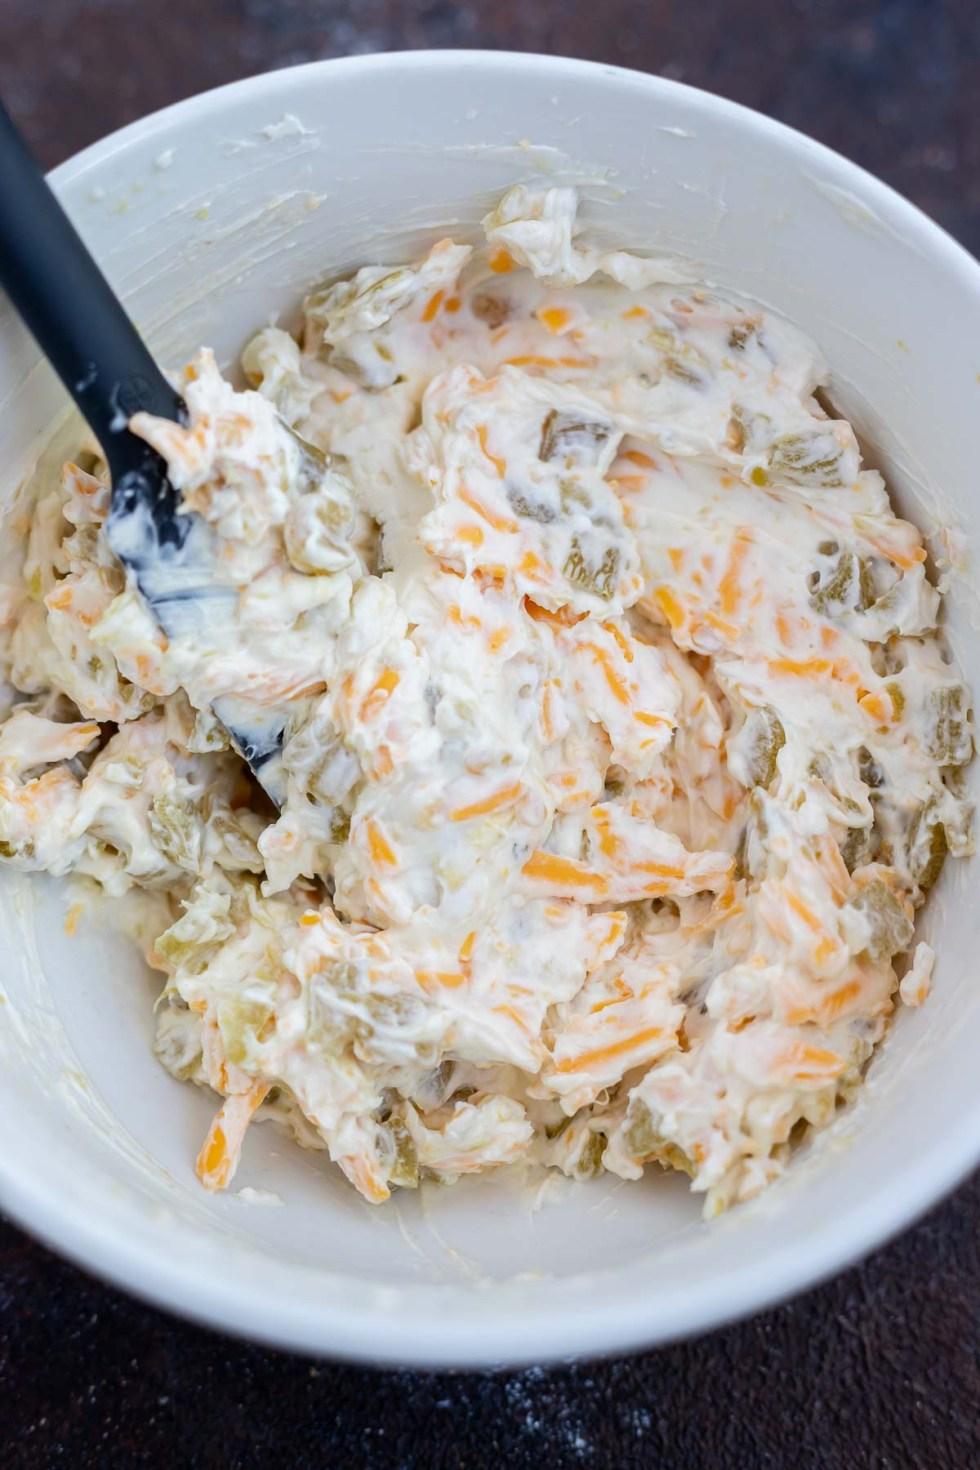 cream cheese mixture in white bowl